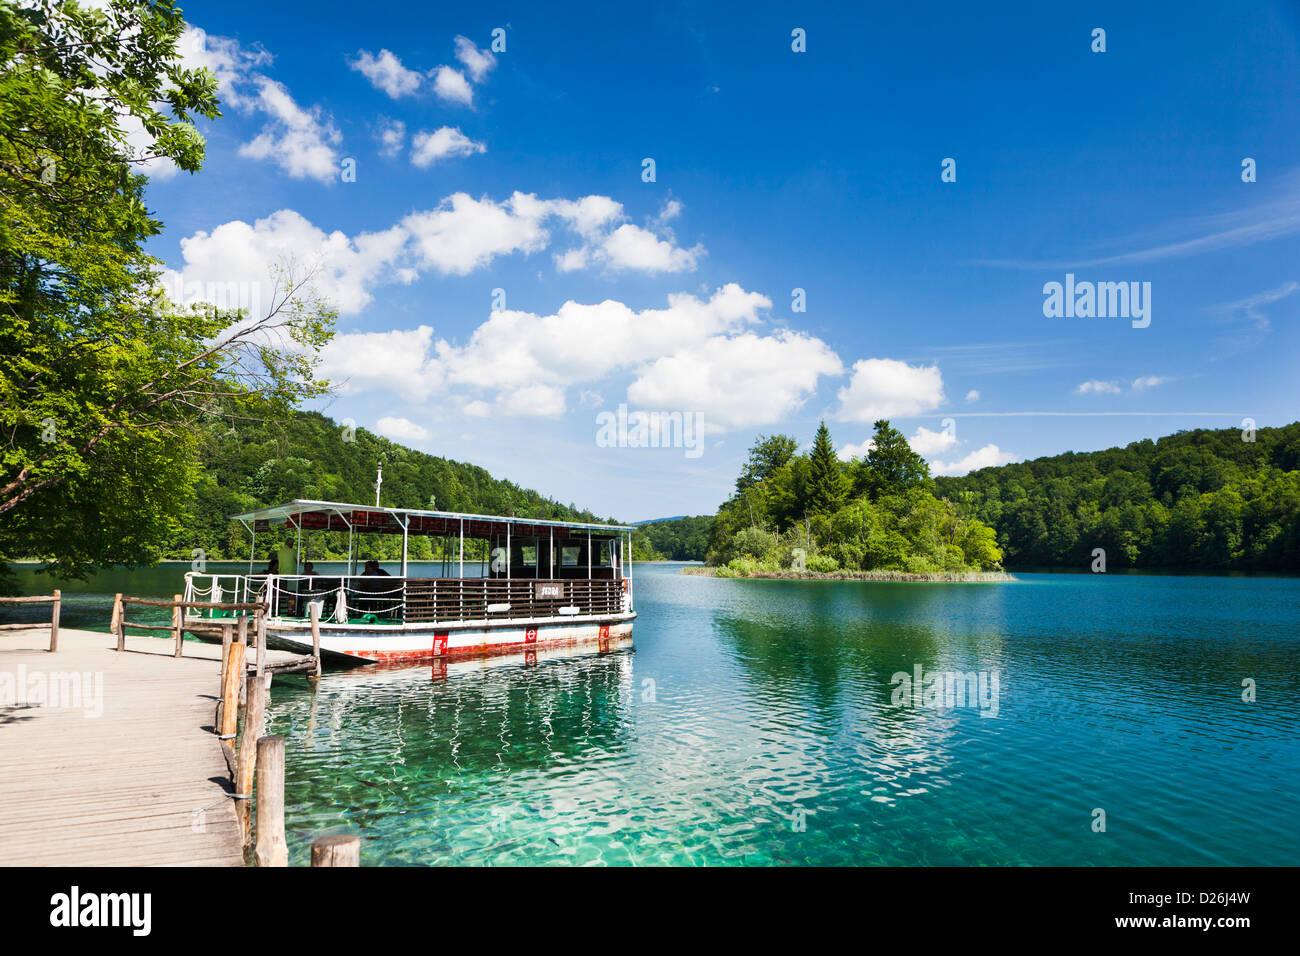 The Plitvice Lakes in the National Park Plitvicka Jezera in Croatia. Visitors taking a cruise on lake Kozjak. - Stock Image